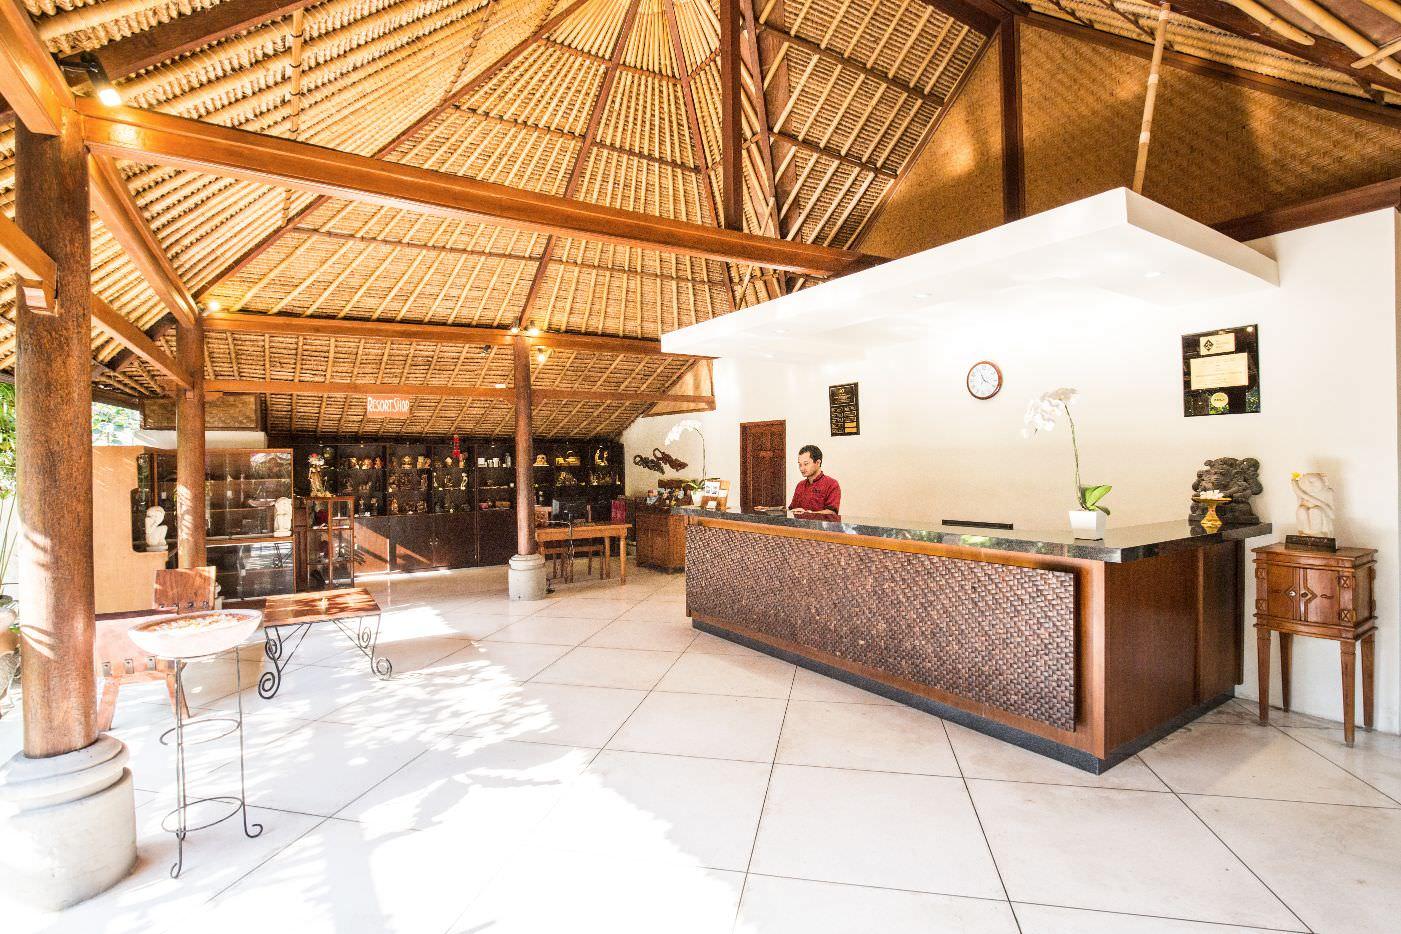 luxury hotel of Karma Royal Candidasa Reception Area